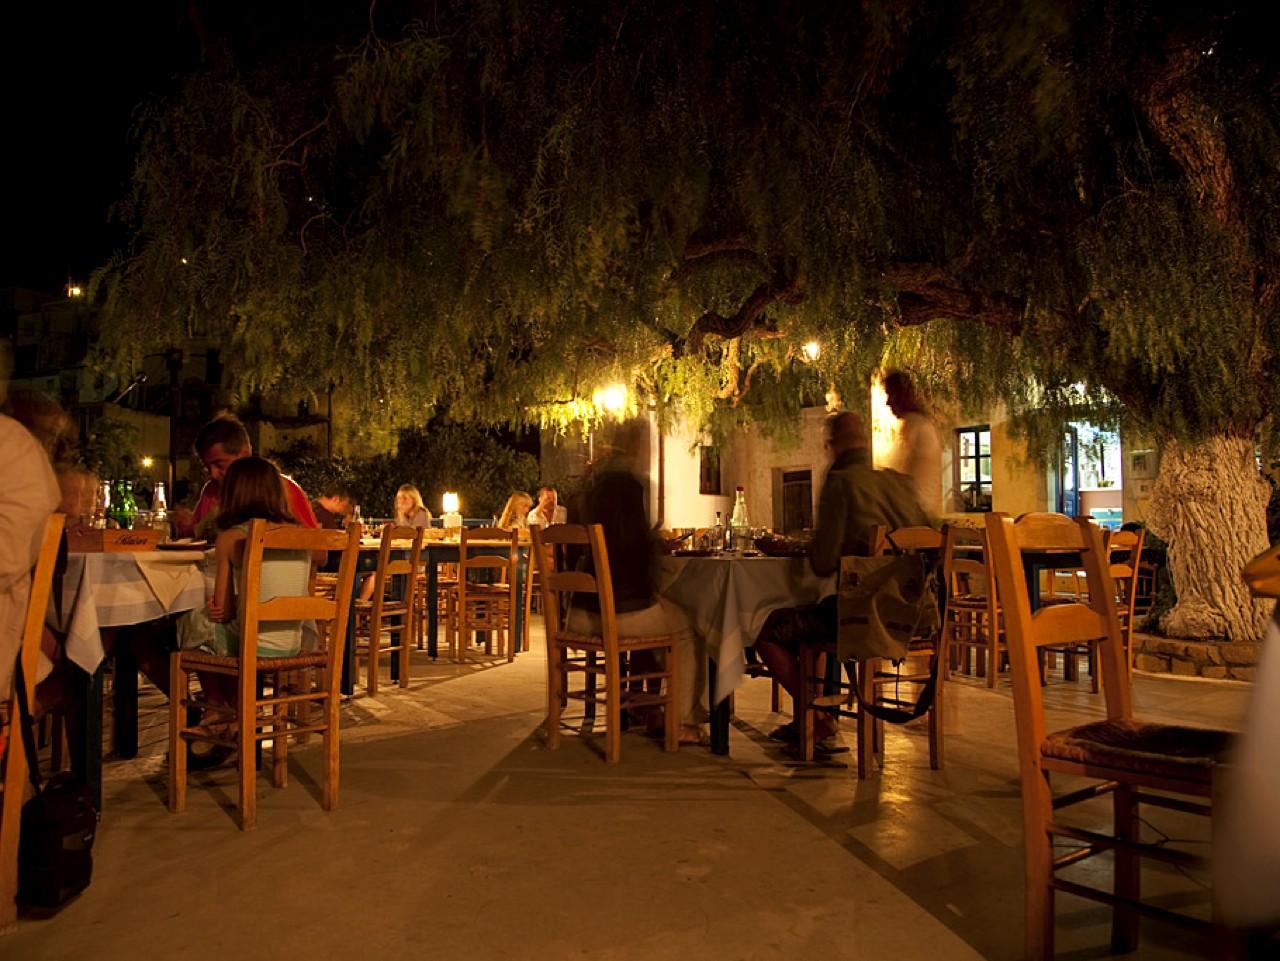 piperia tavern pefkoi village, piperia restaurant pefki village makrigialos, makriyialos eateries crete, pepper restaurant tavern crete